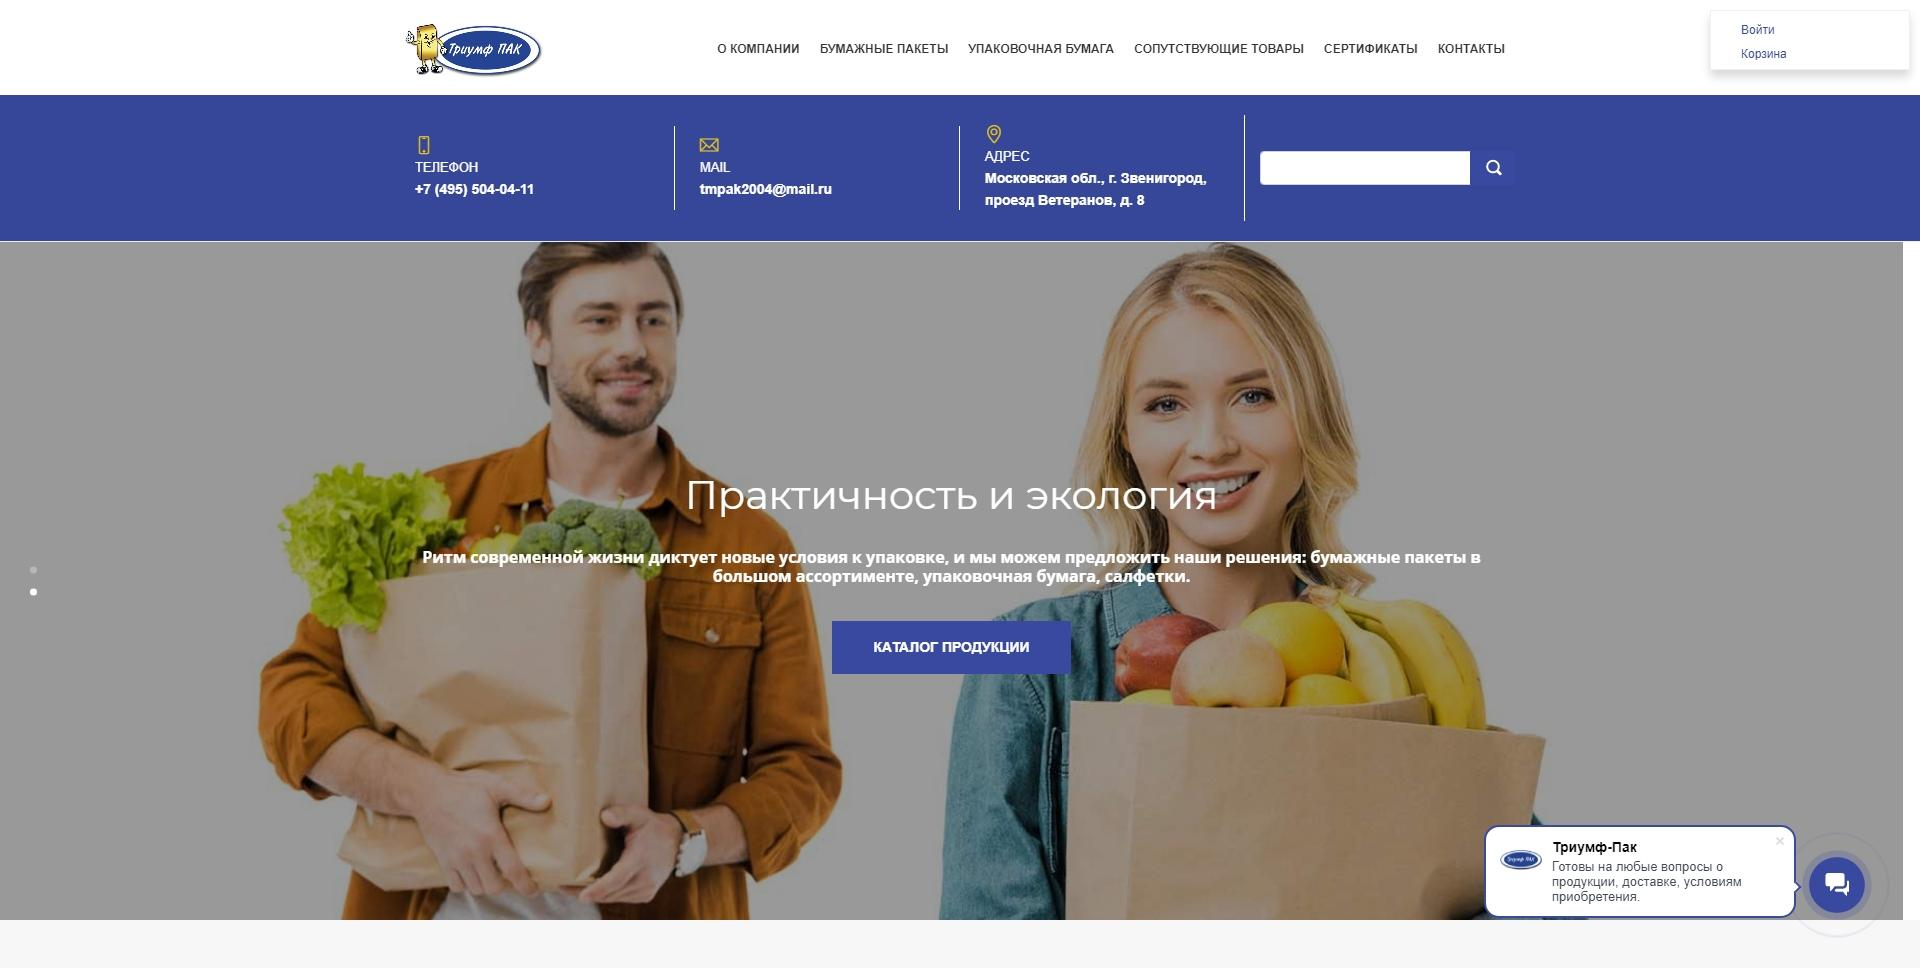 Интернет-магазин пакетов